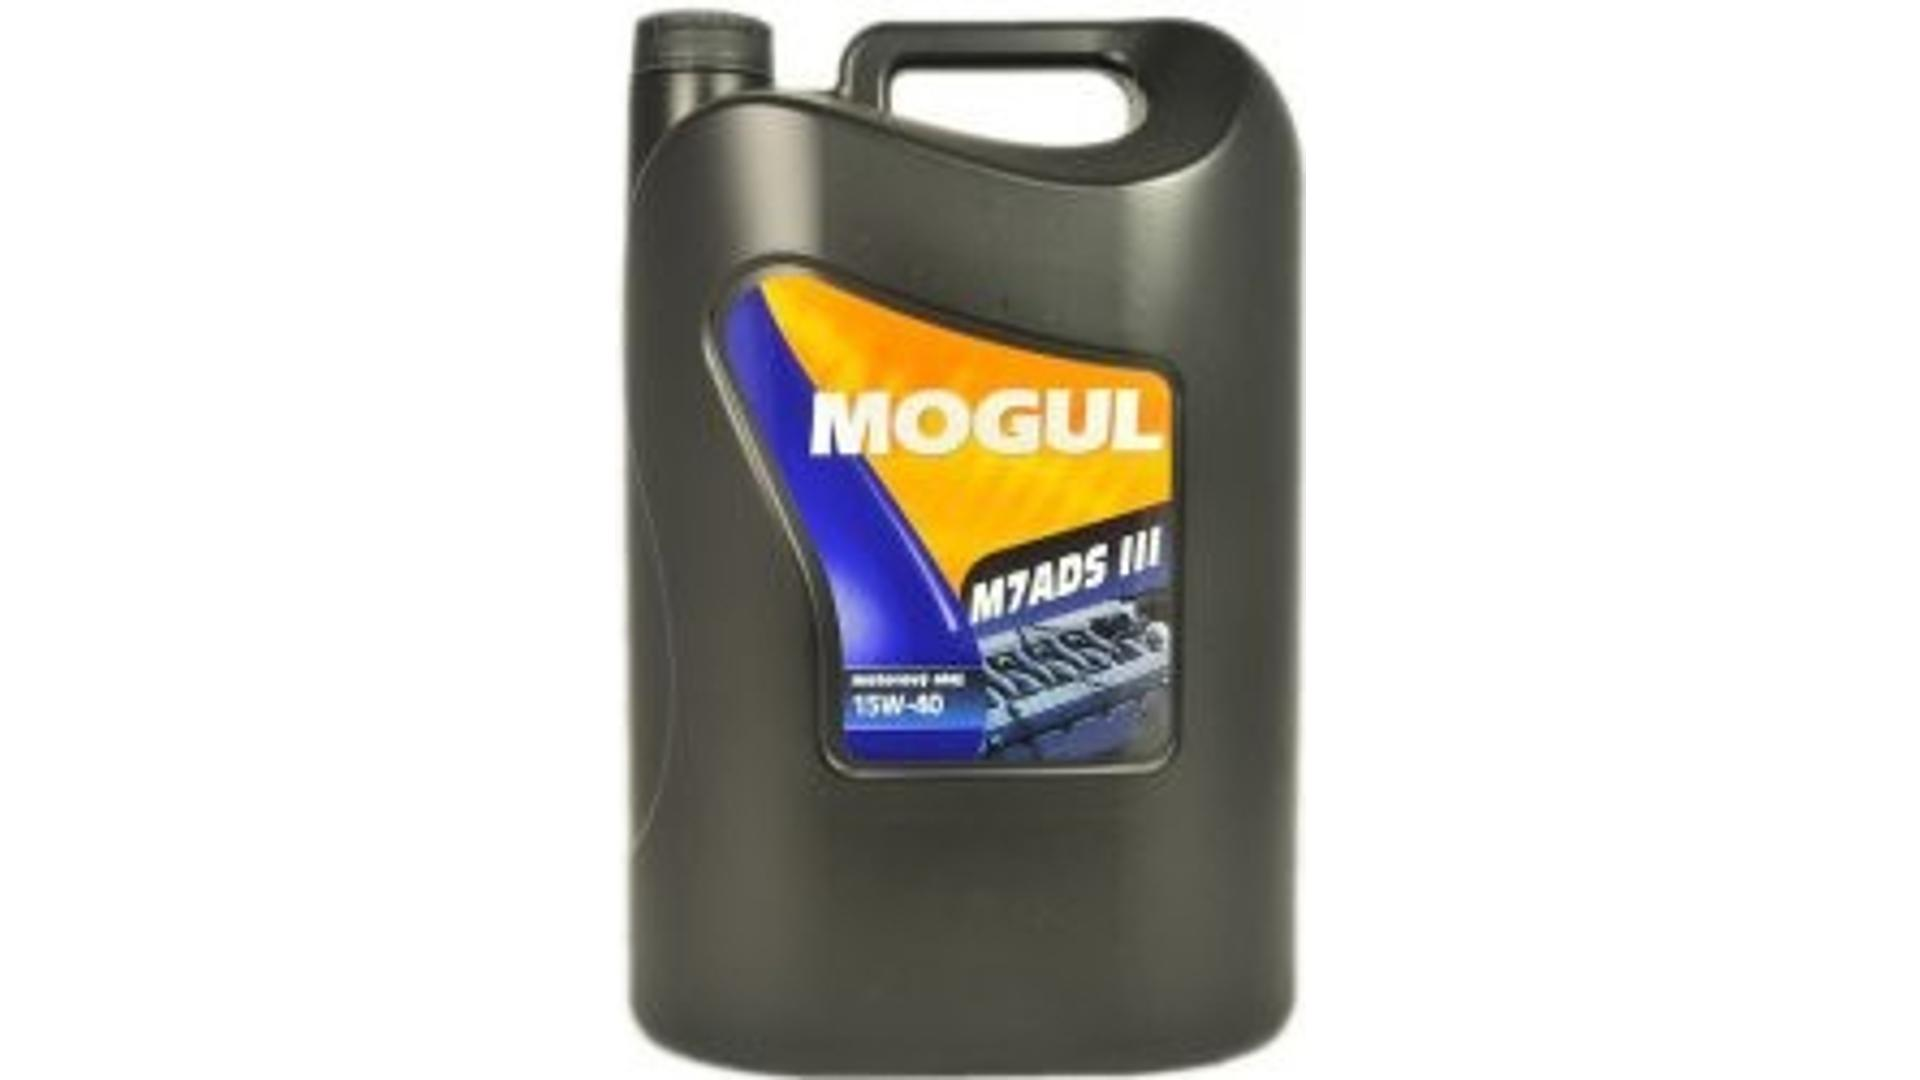 MOGUL M7ADS III 15W-40 /10